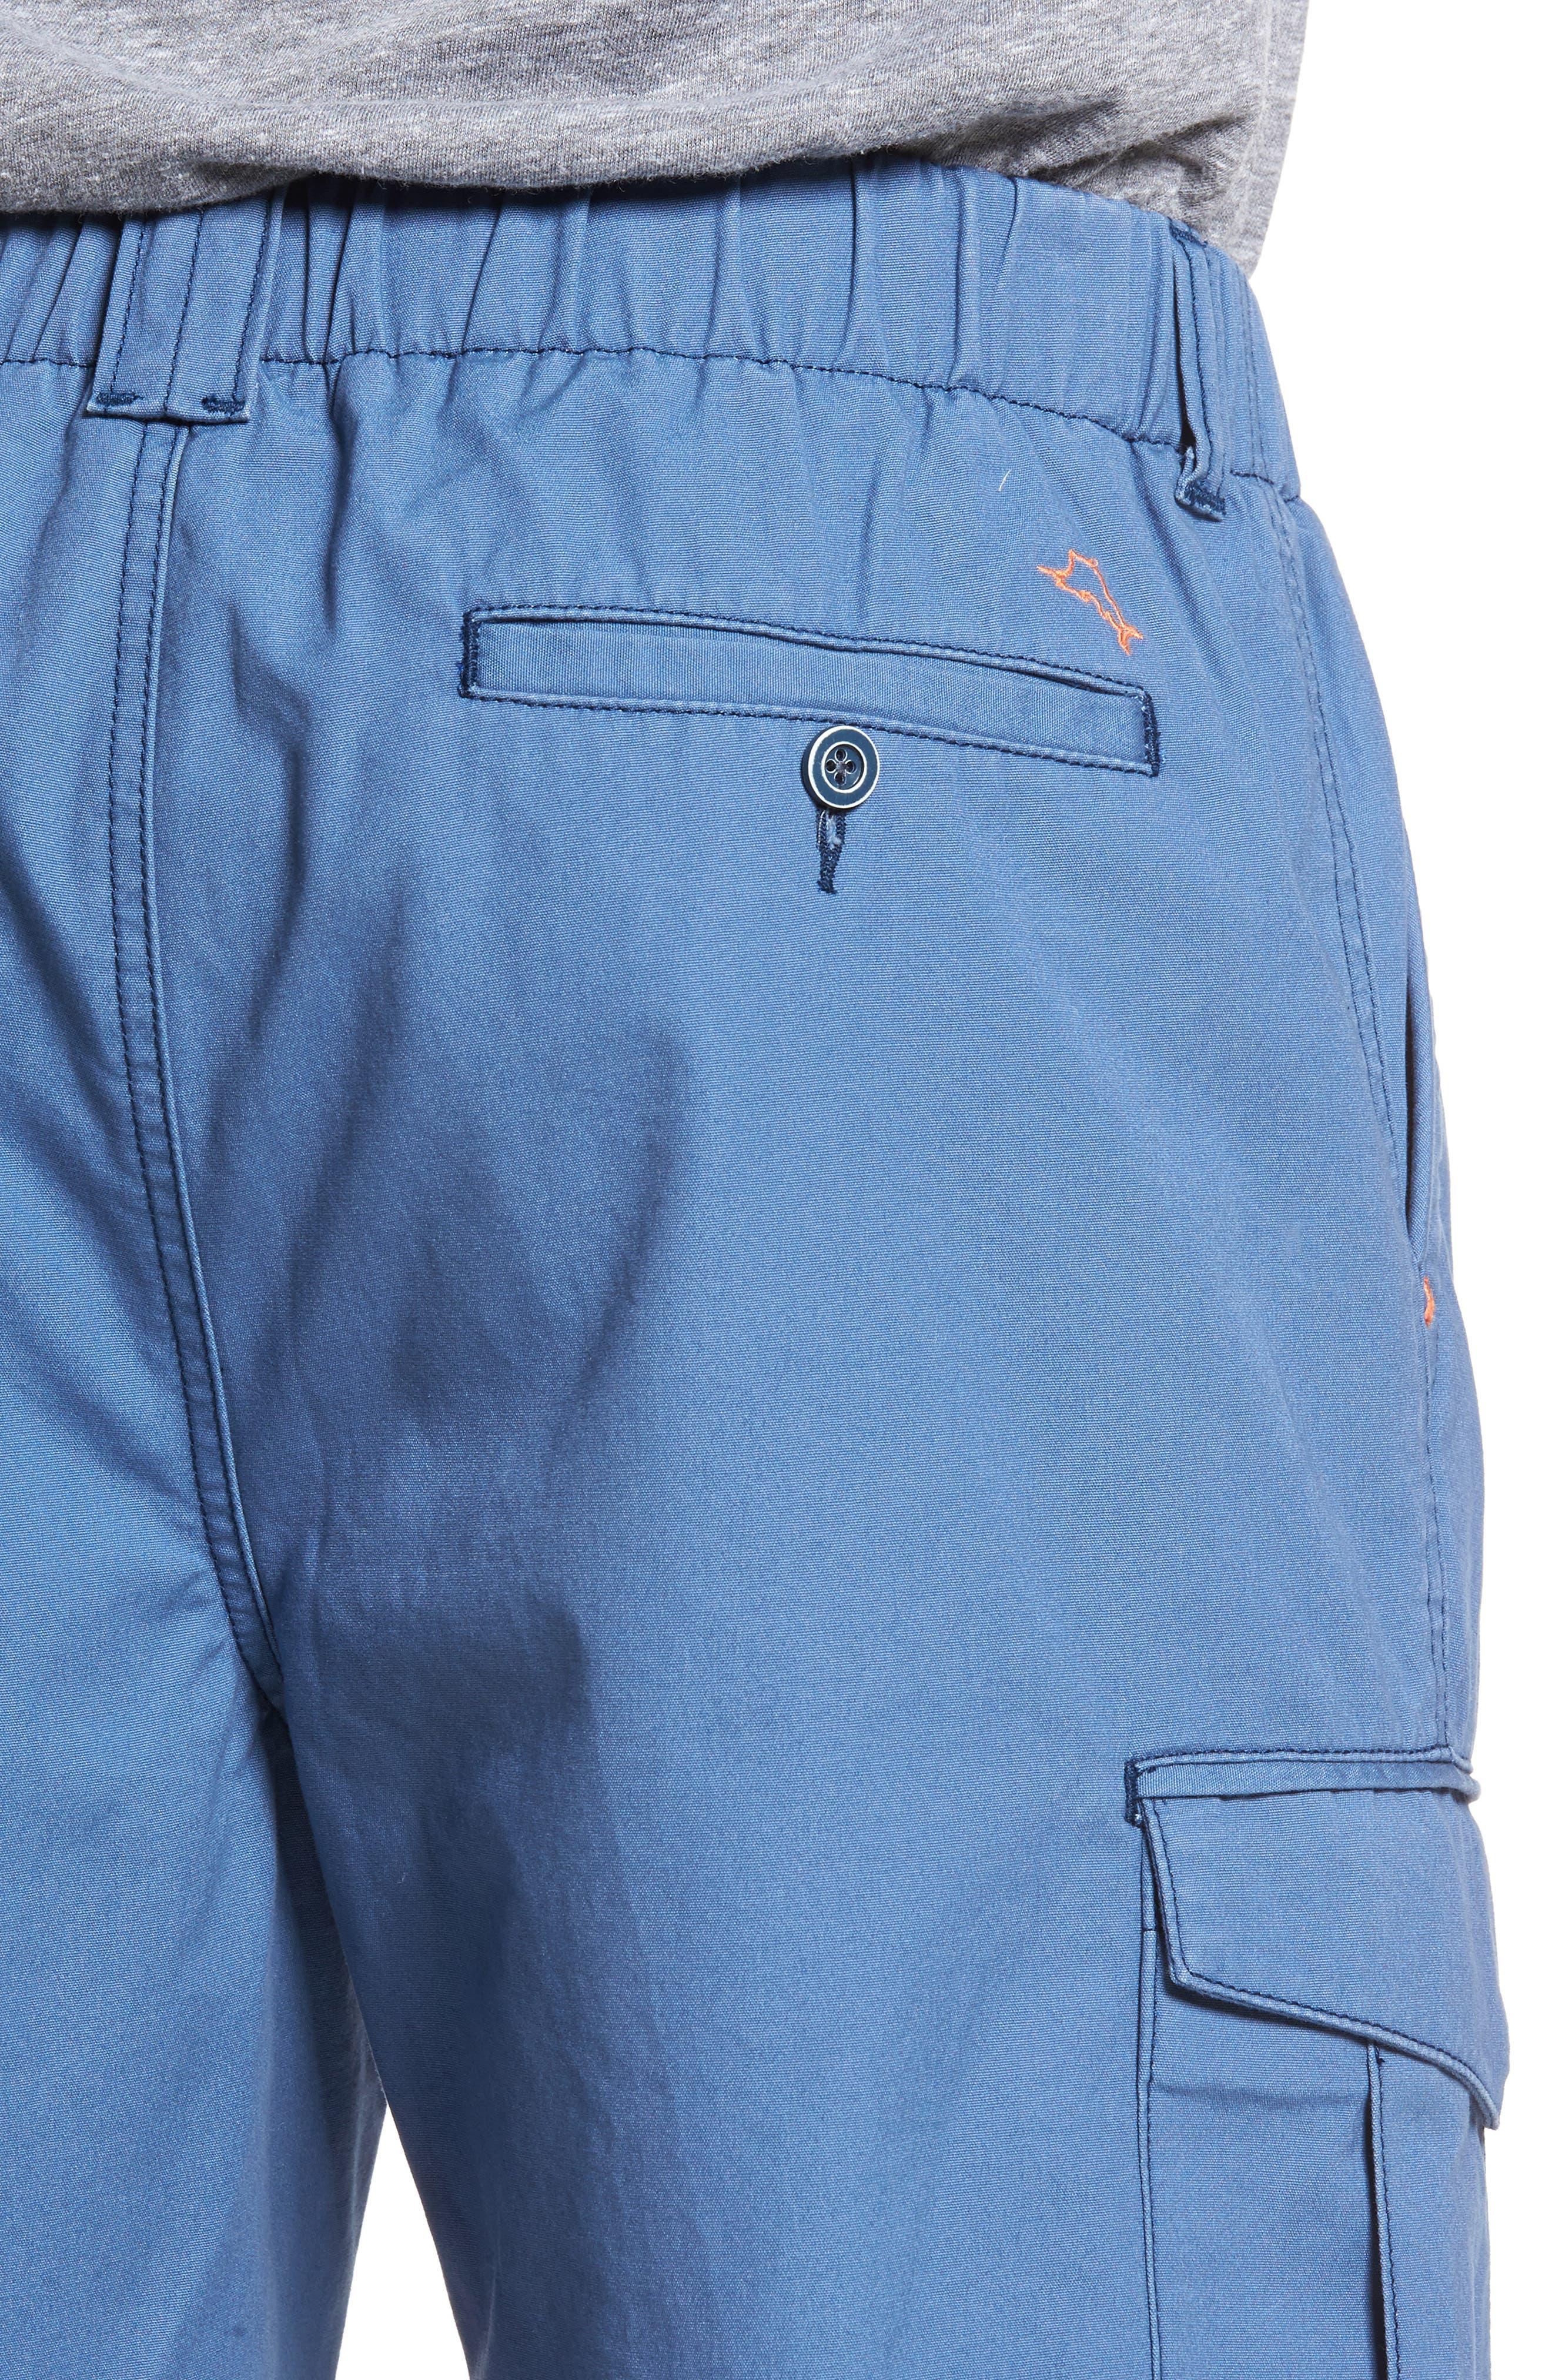 Island Survivalist Cargo Shorts,                             Alternate thumbnail 4, color,                             Dockside Blue